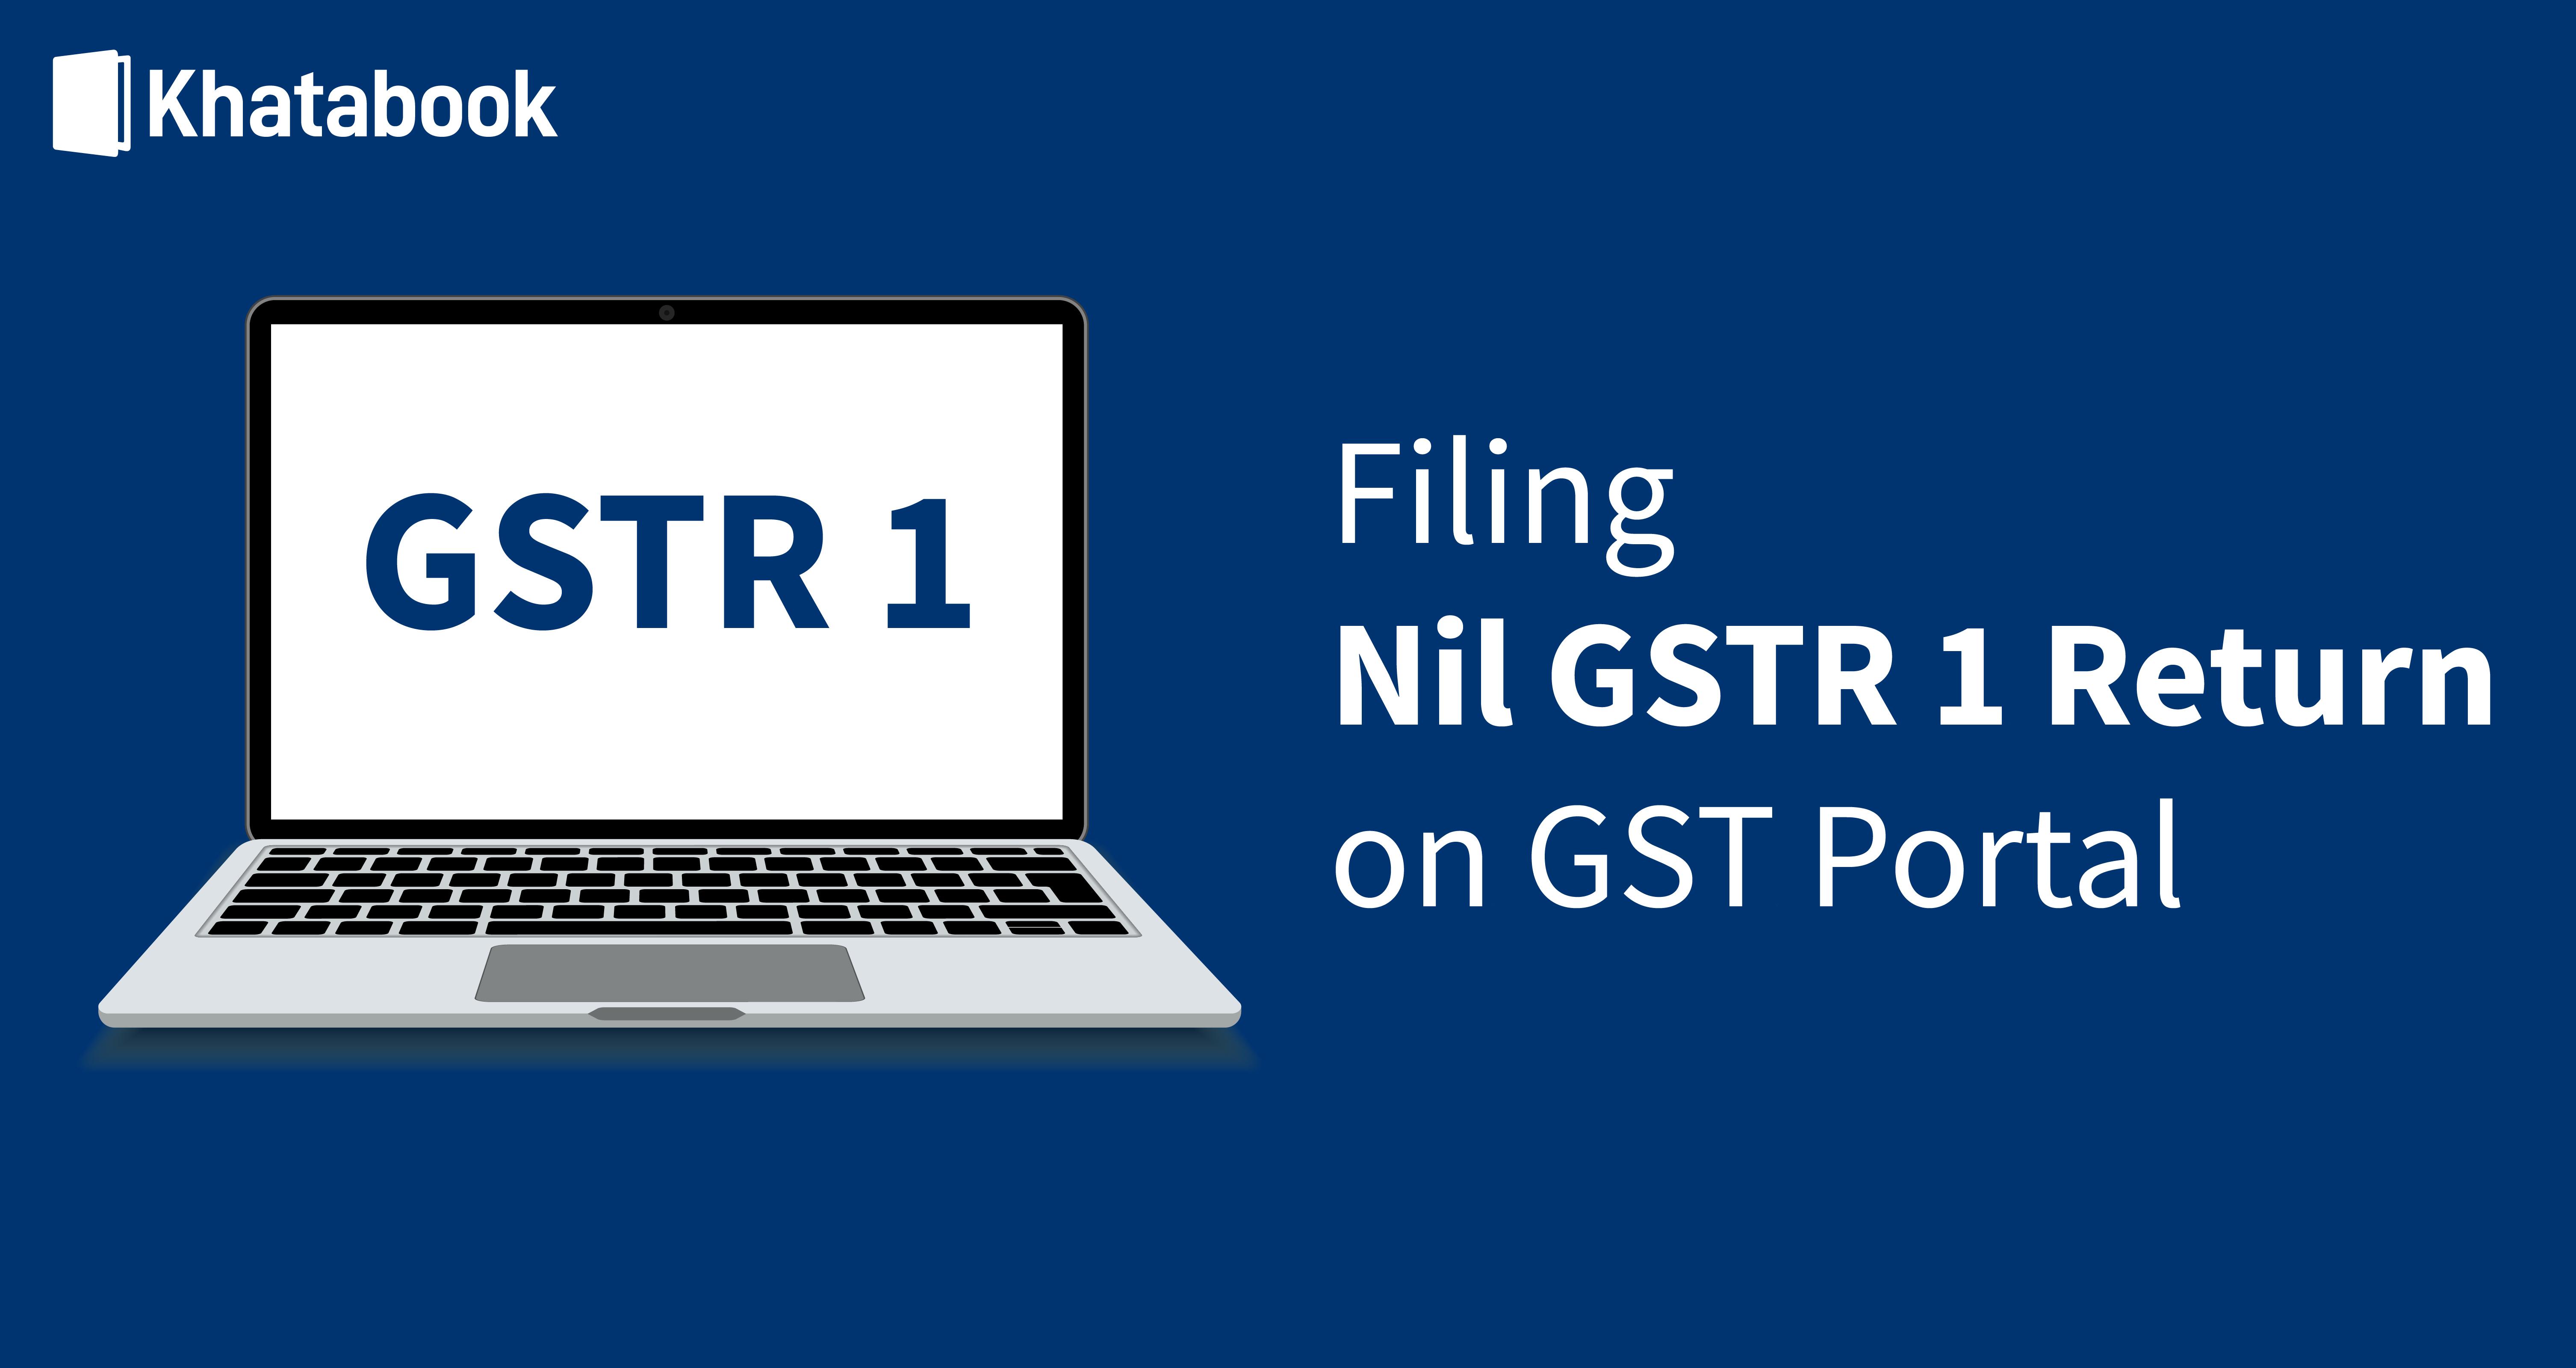 How To File Nil GSTR 1 Return on GST Portal